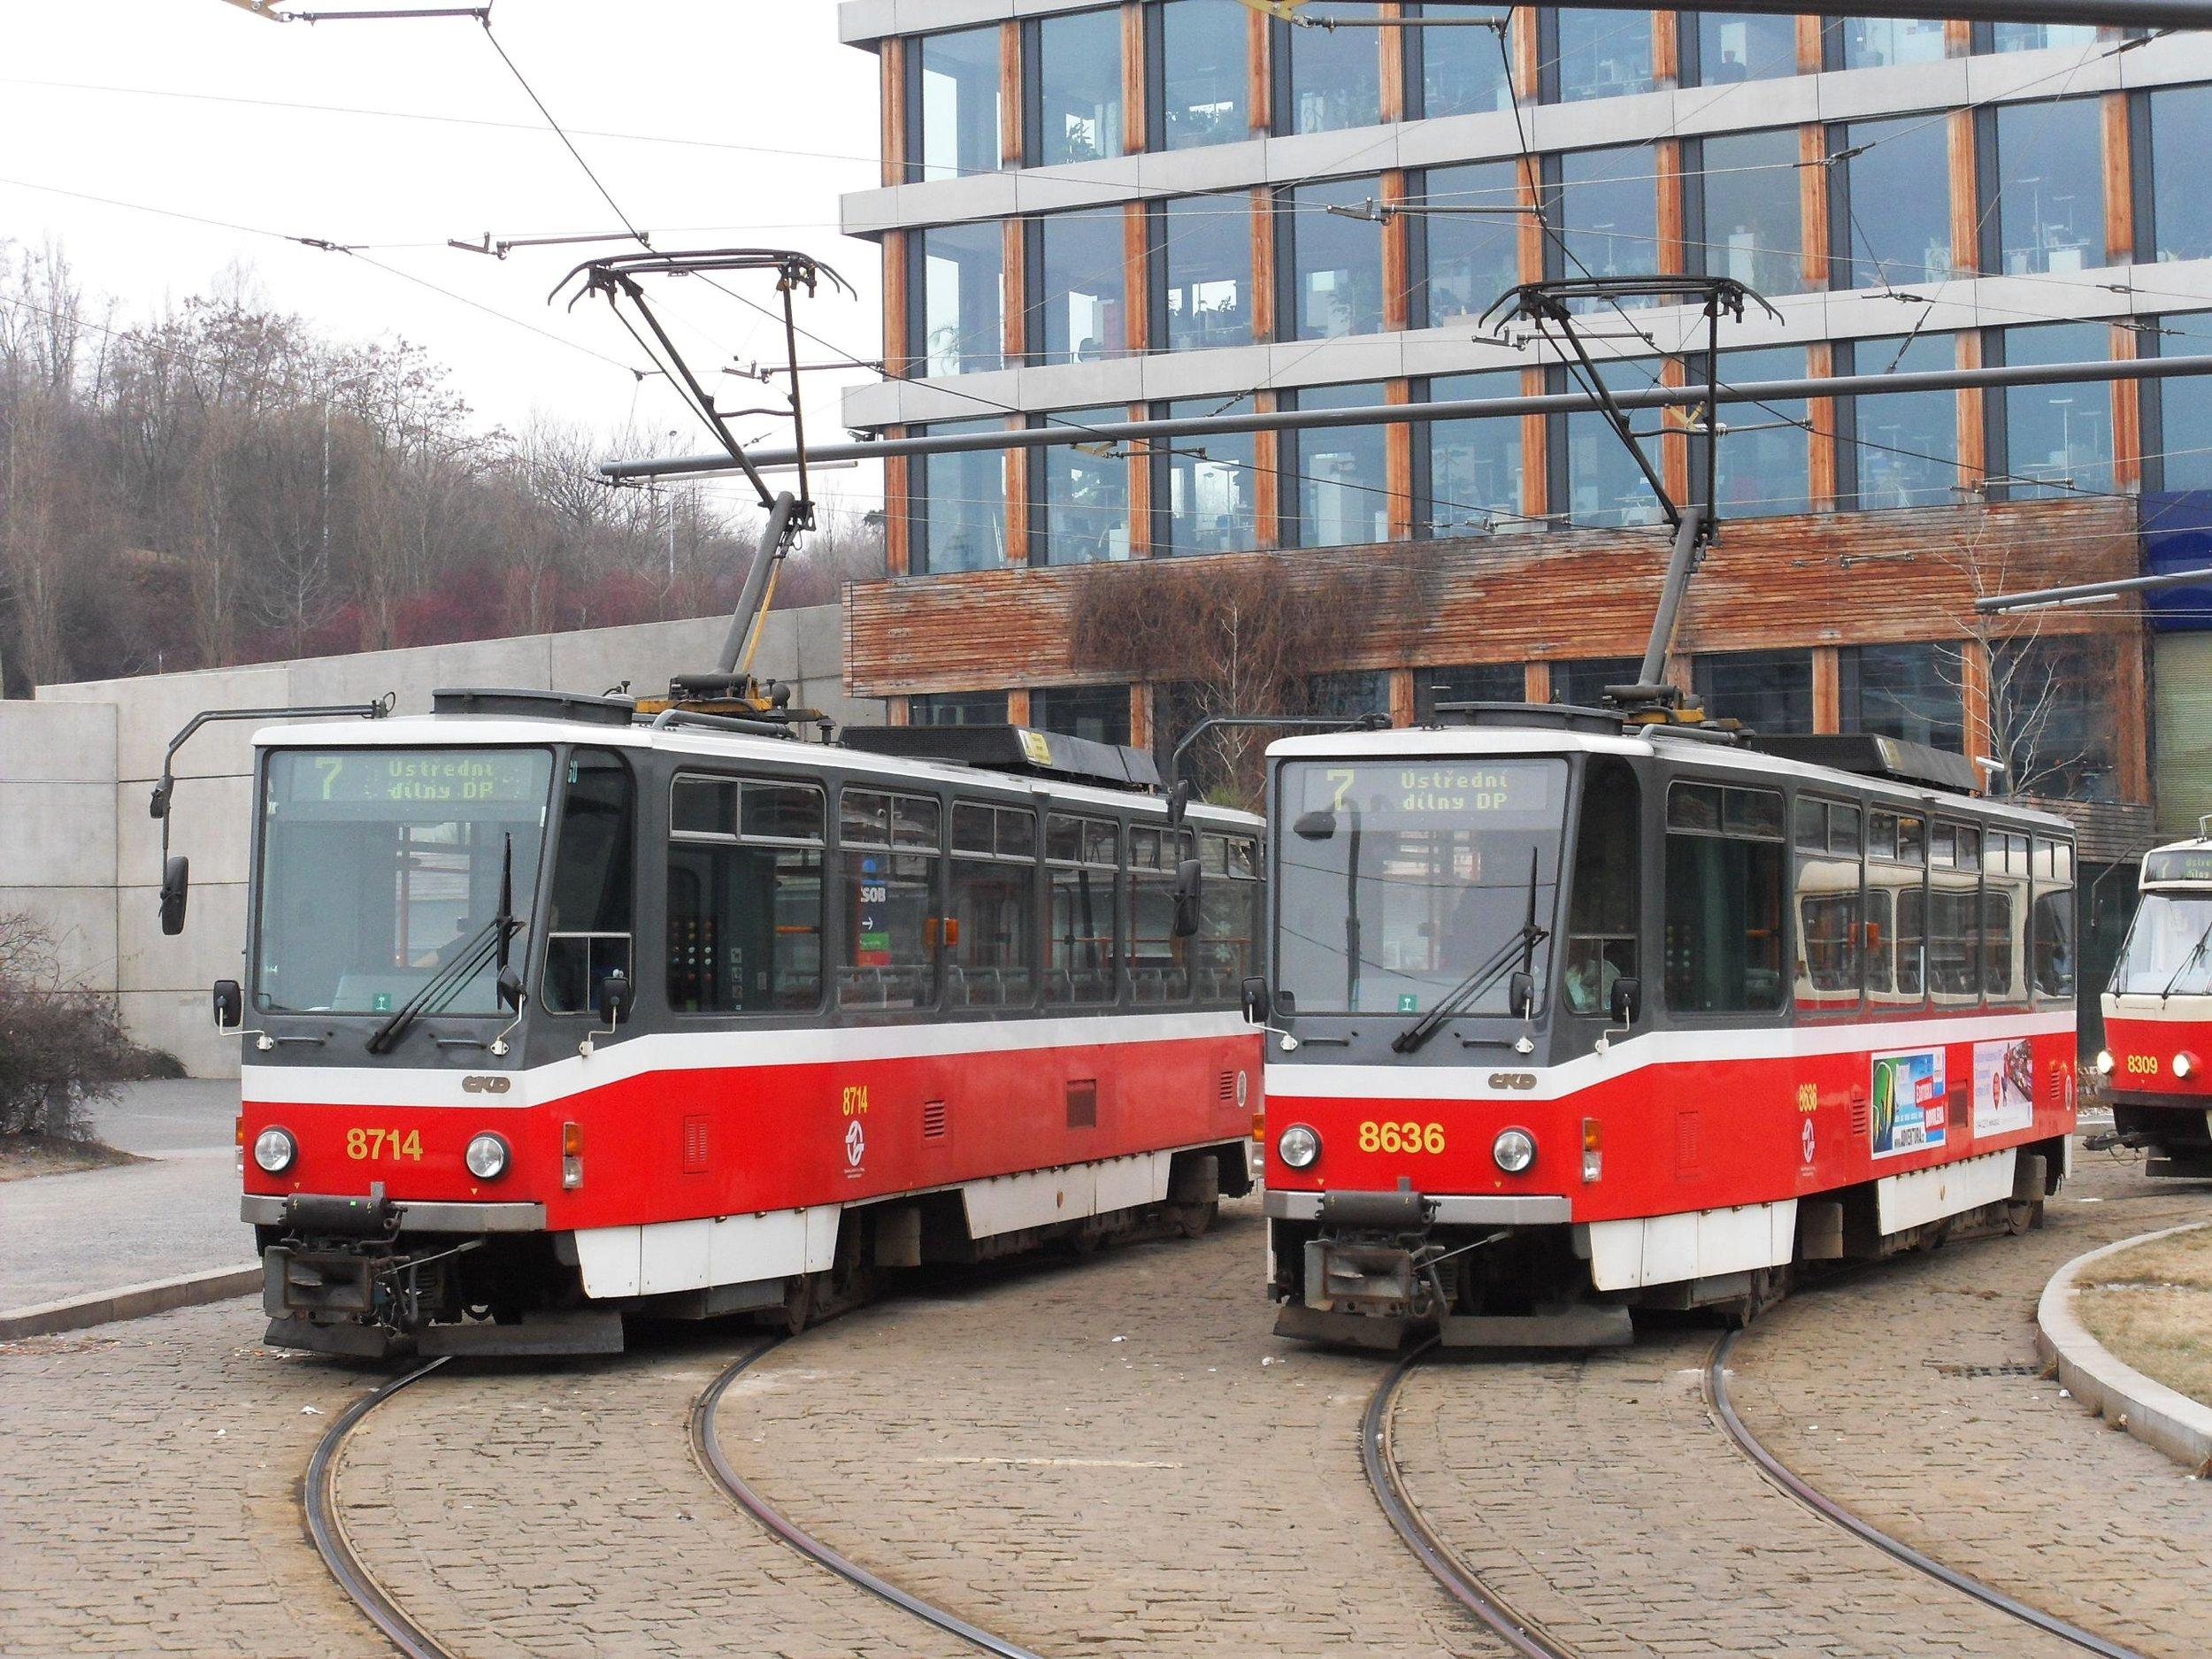 Dvojice tramvají typu T6A5 na smyčce Radlická v Praze dne 27. 2. 2011. (zdroj: Wikipedia.org, foto: Harold)